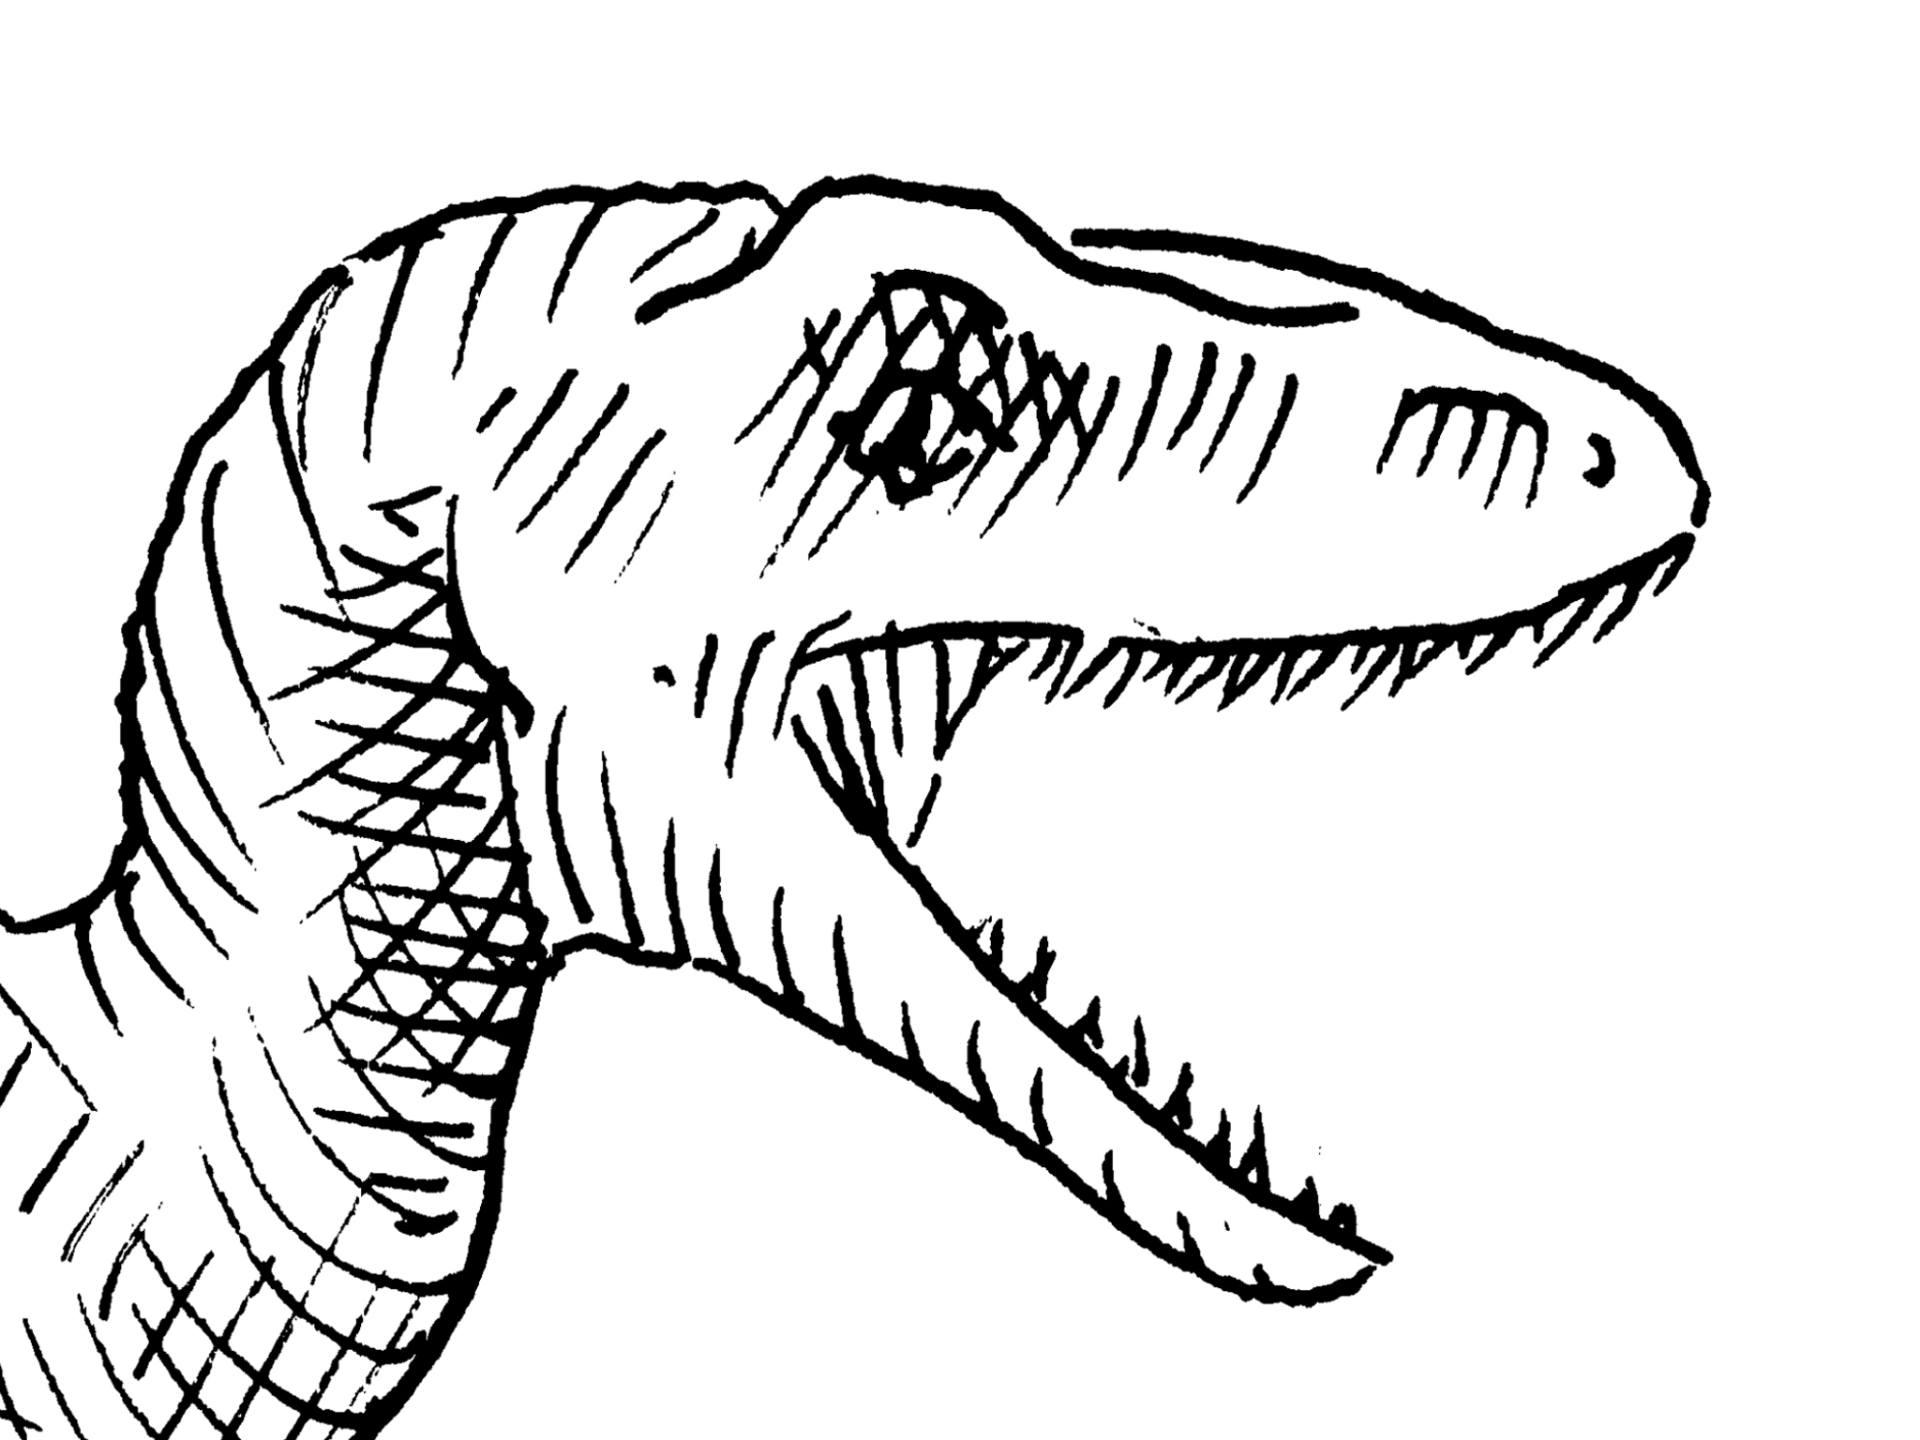 1920x1440 Saatchi Art Velociraptor